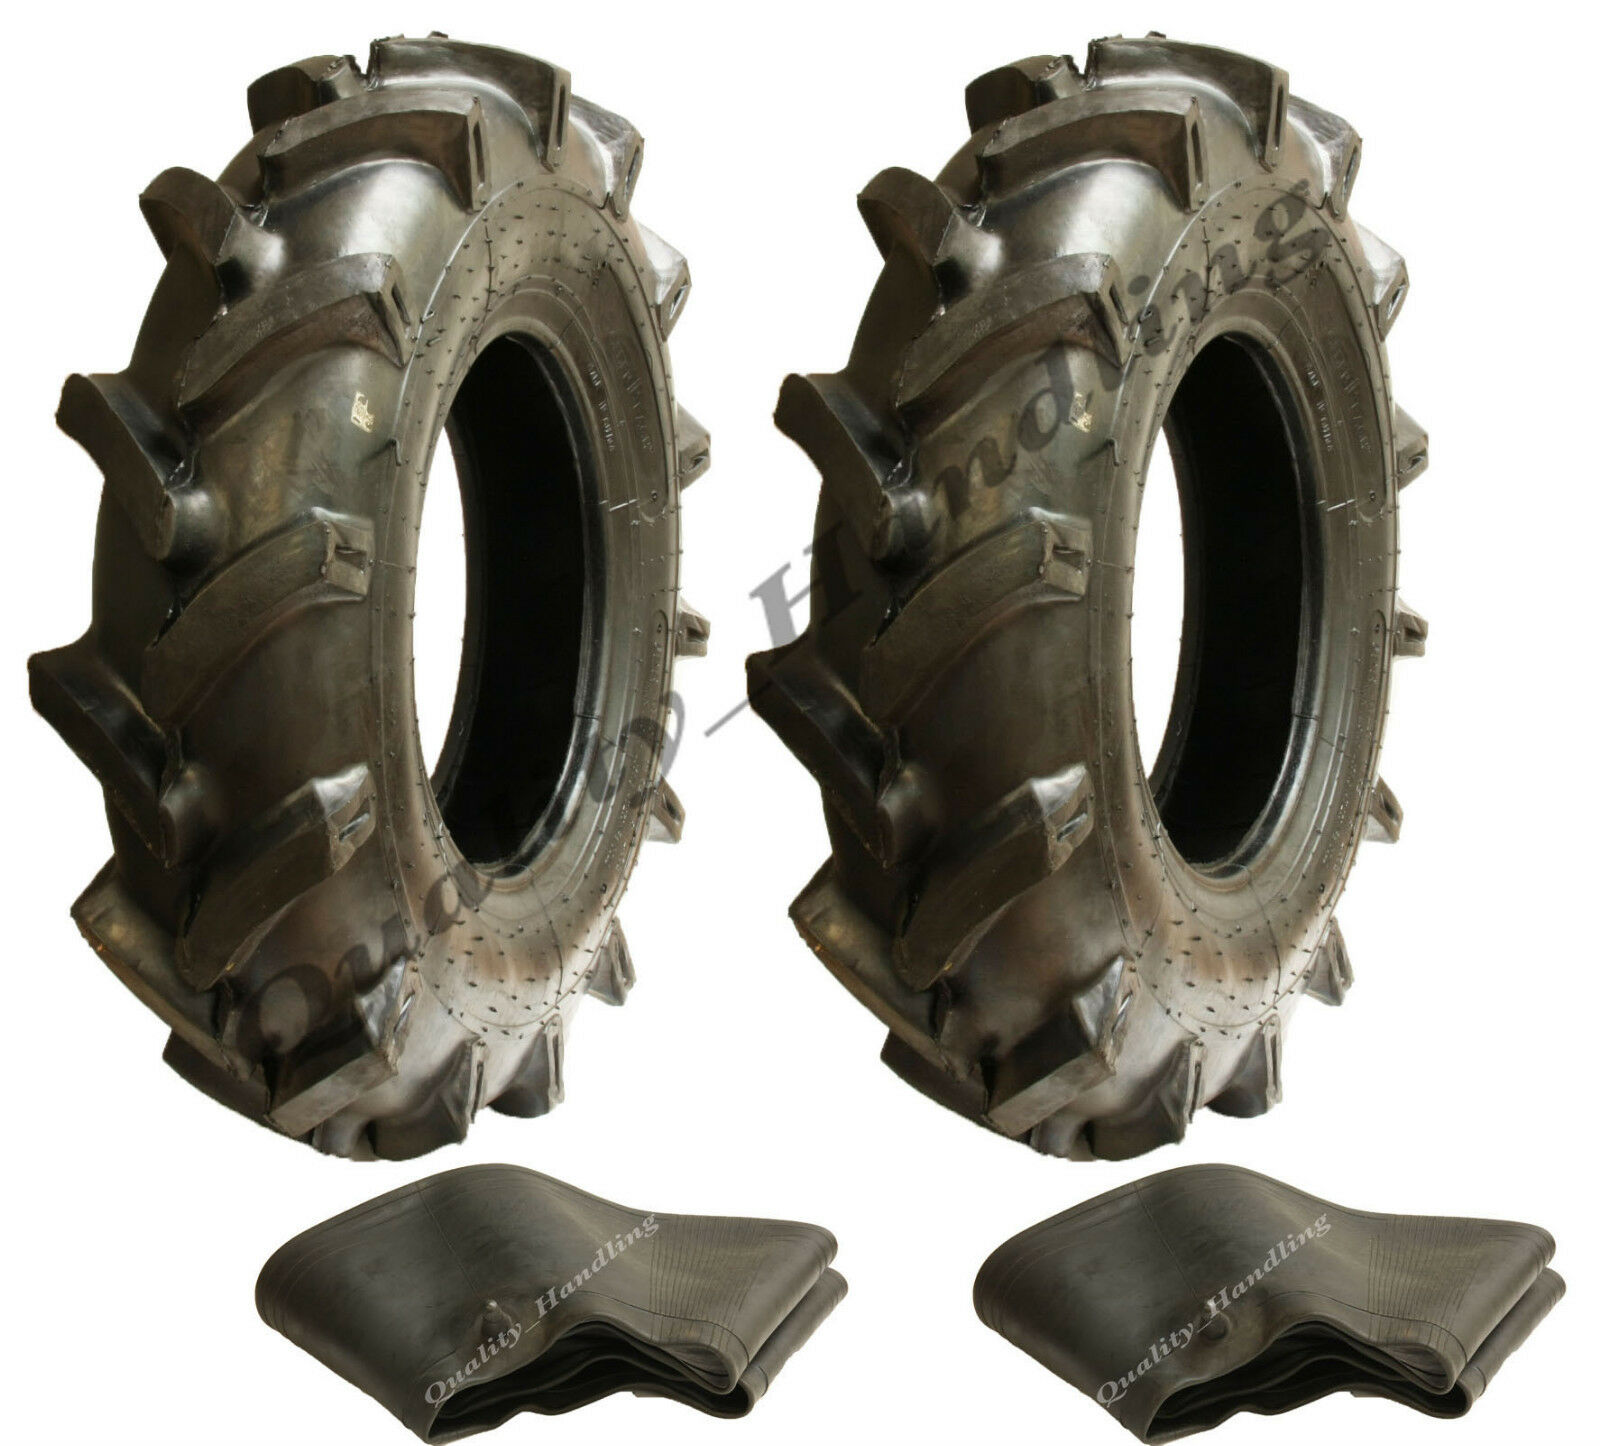 2 - 600 12 (6ply) Cleated Reifen Offen Cente  Rotovator Stecker Winkel +